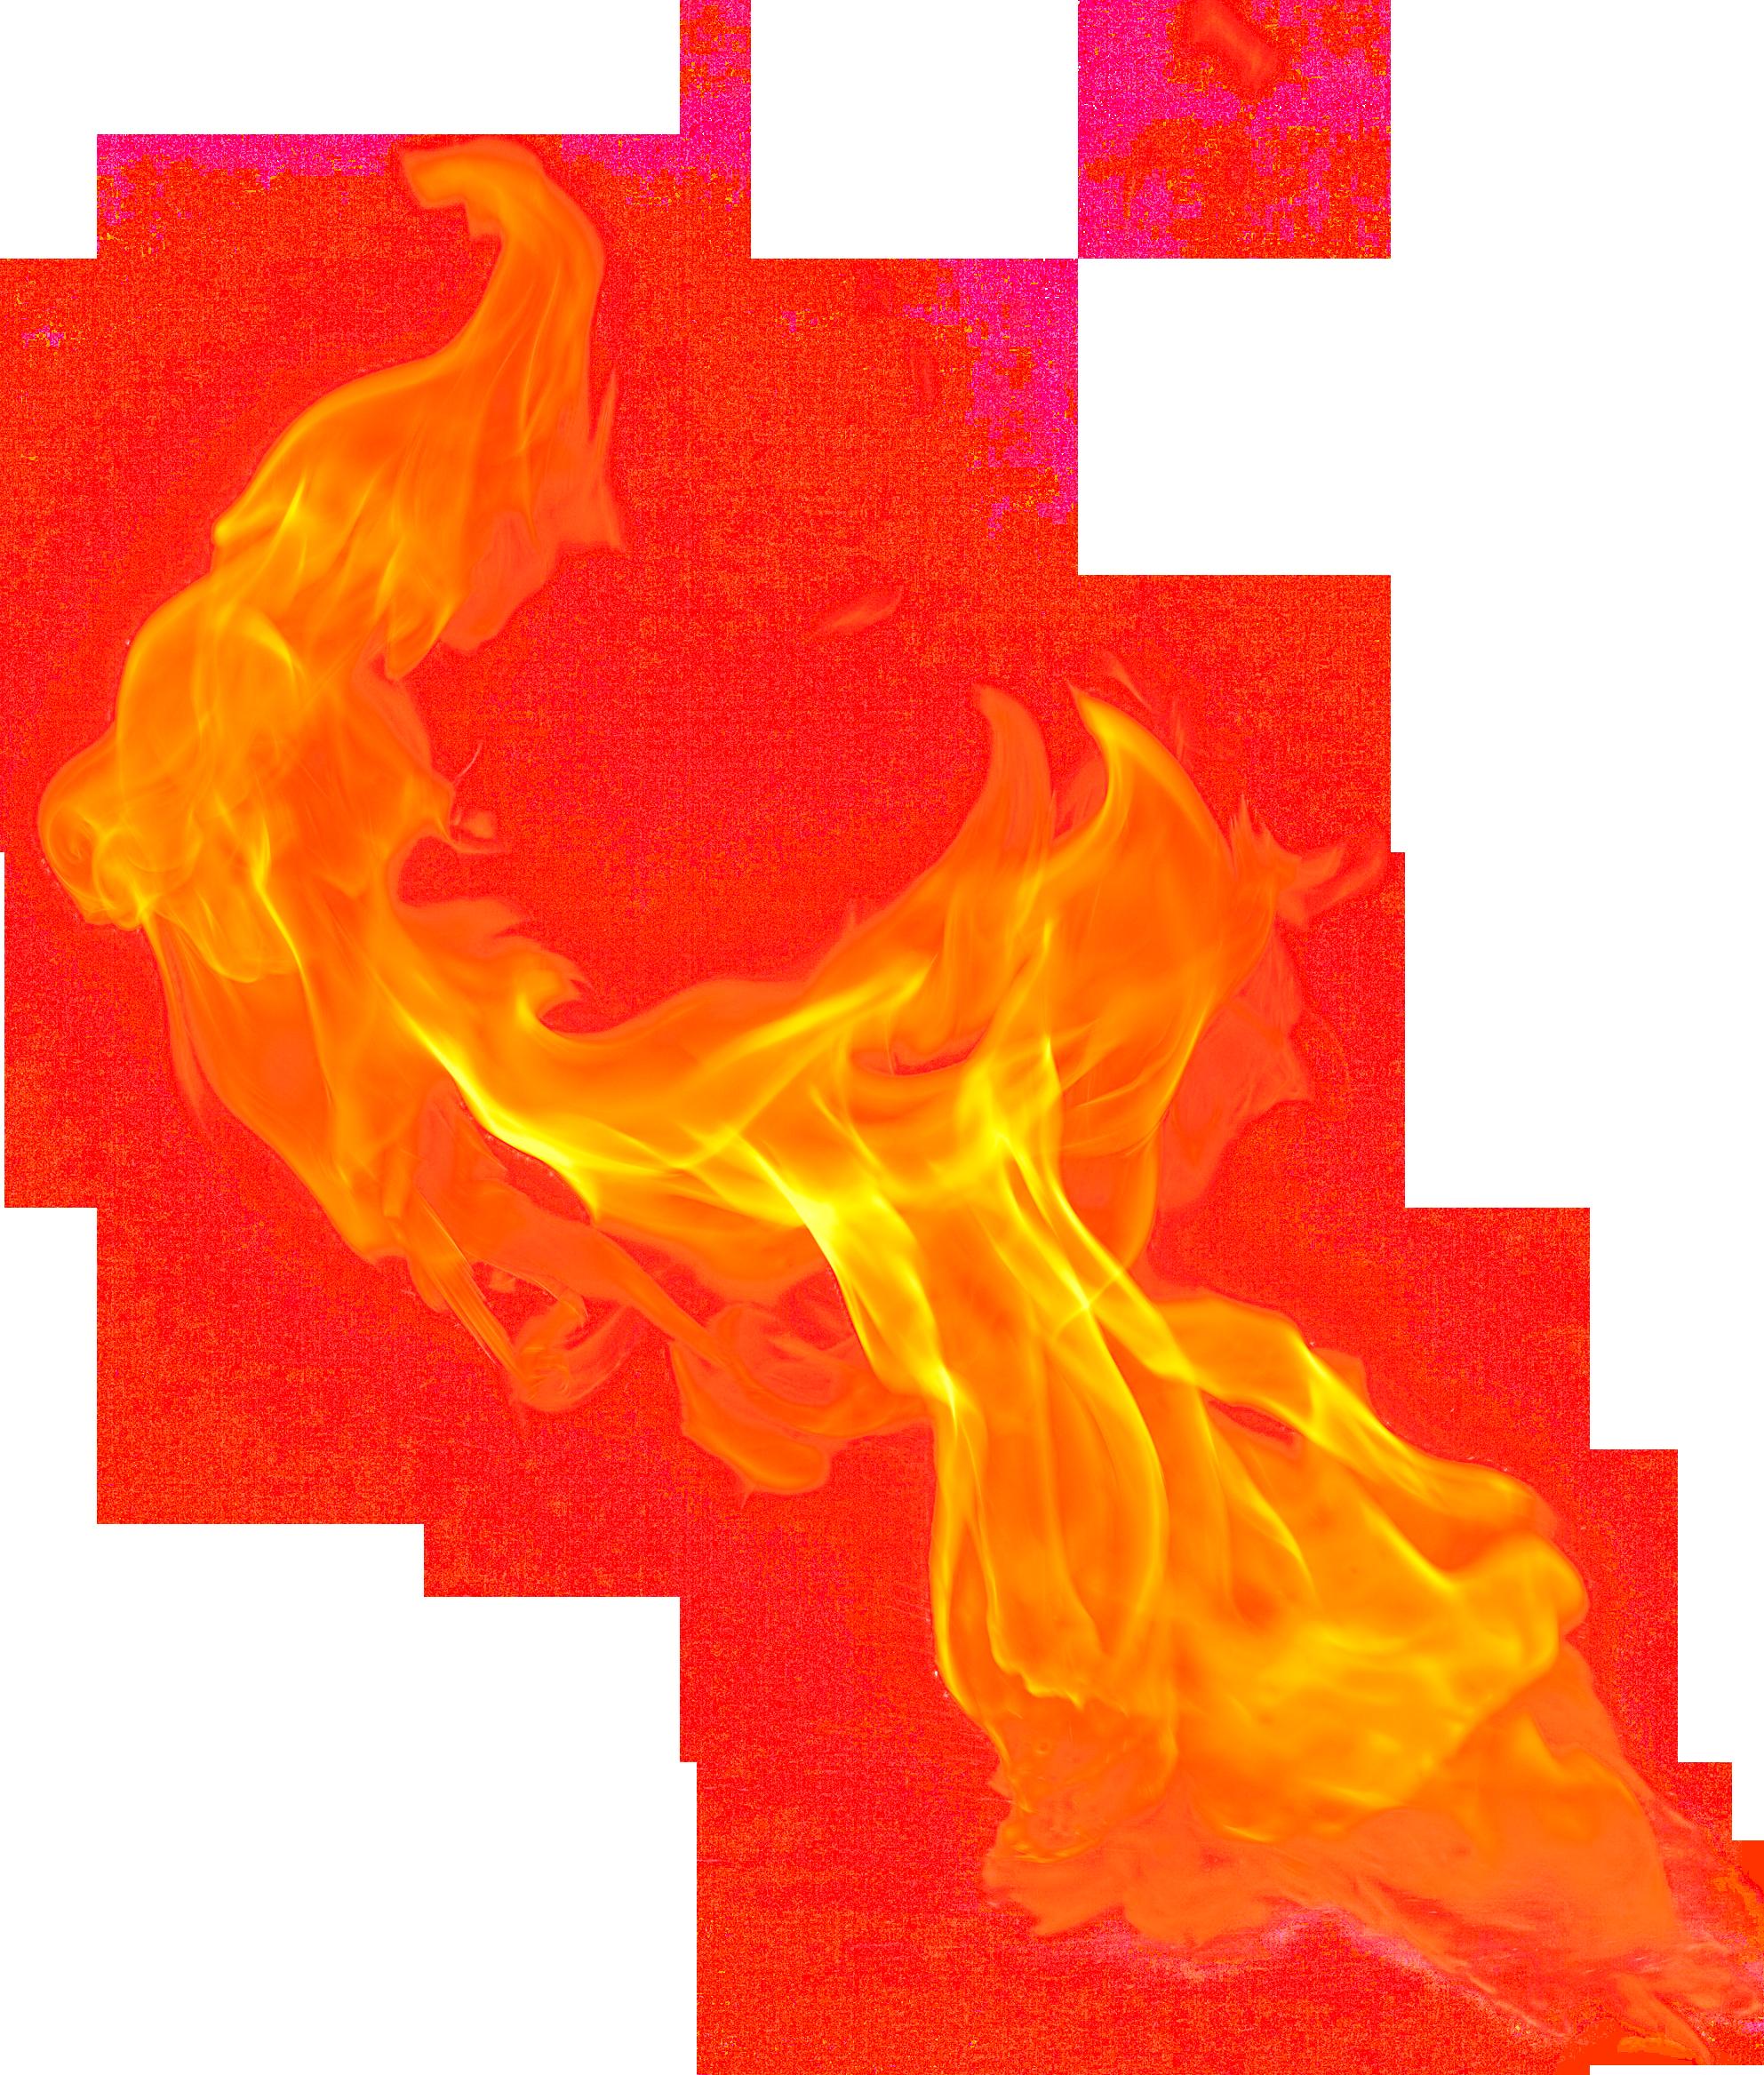 Fire Flame PNG Image Fire image, Fire art, Smoke art